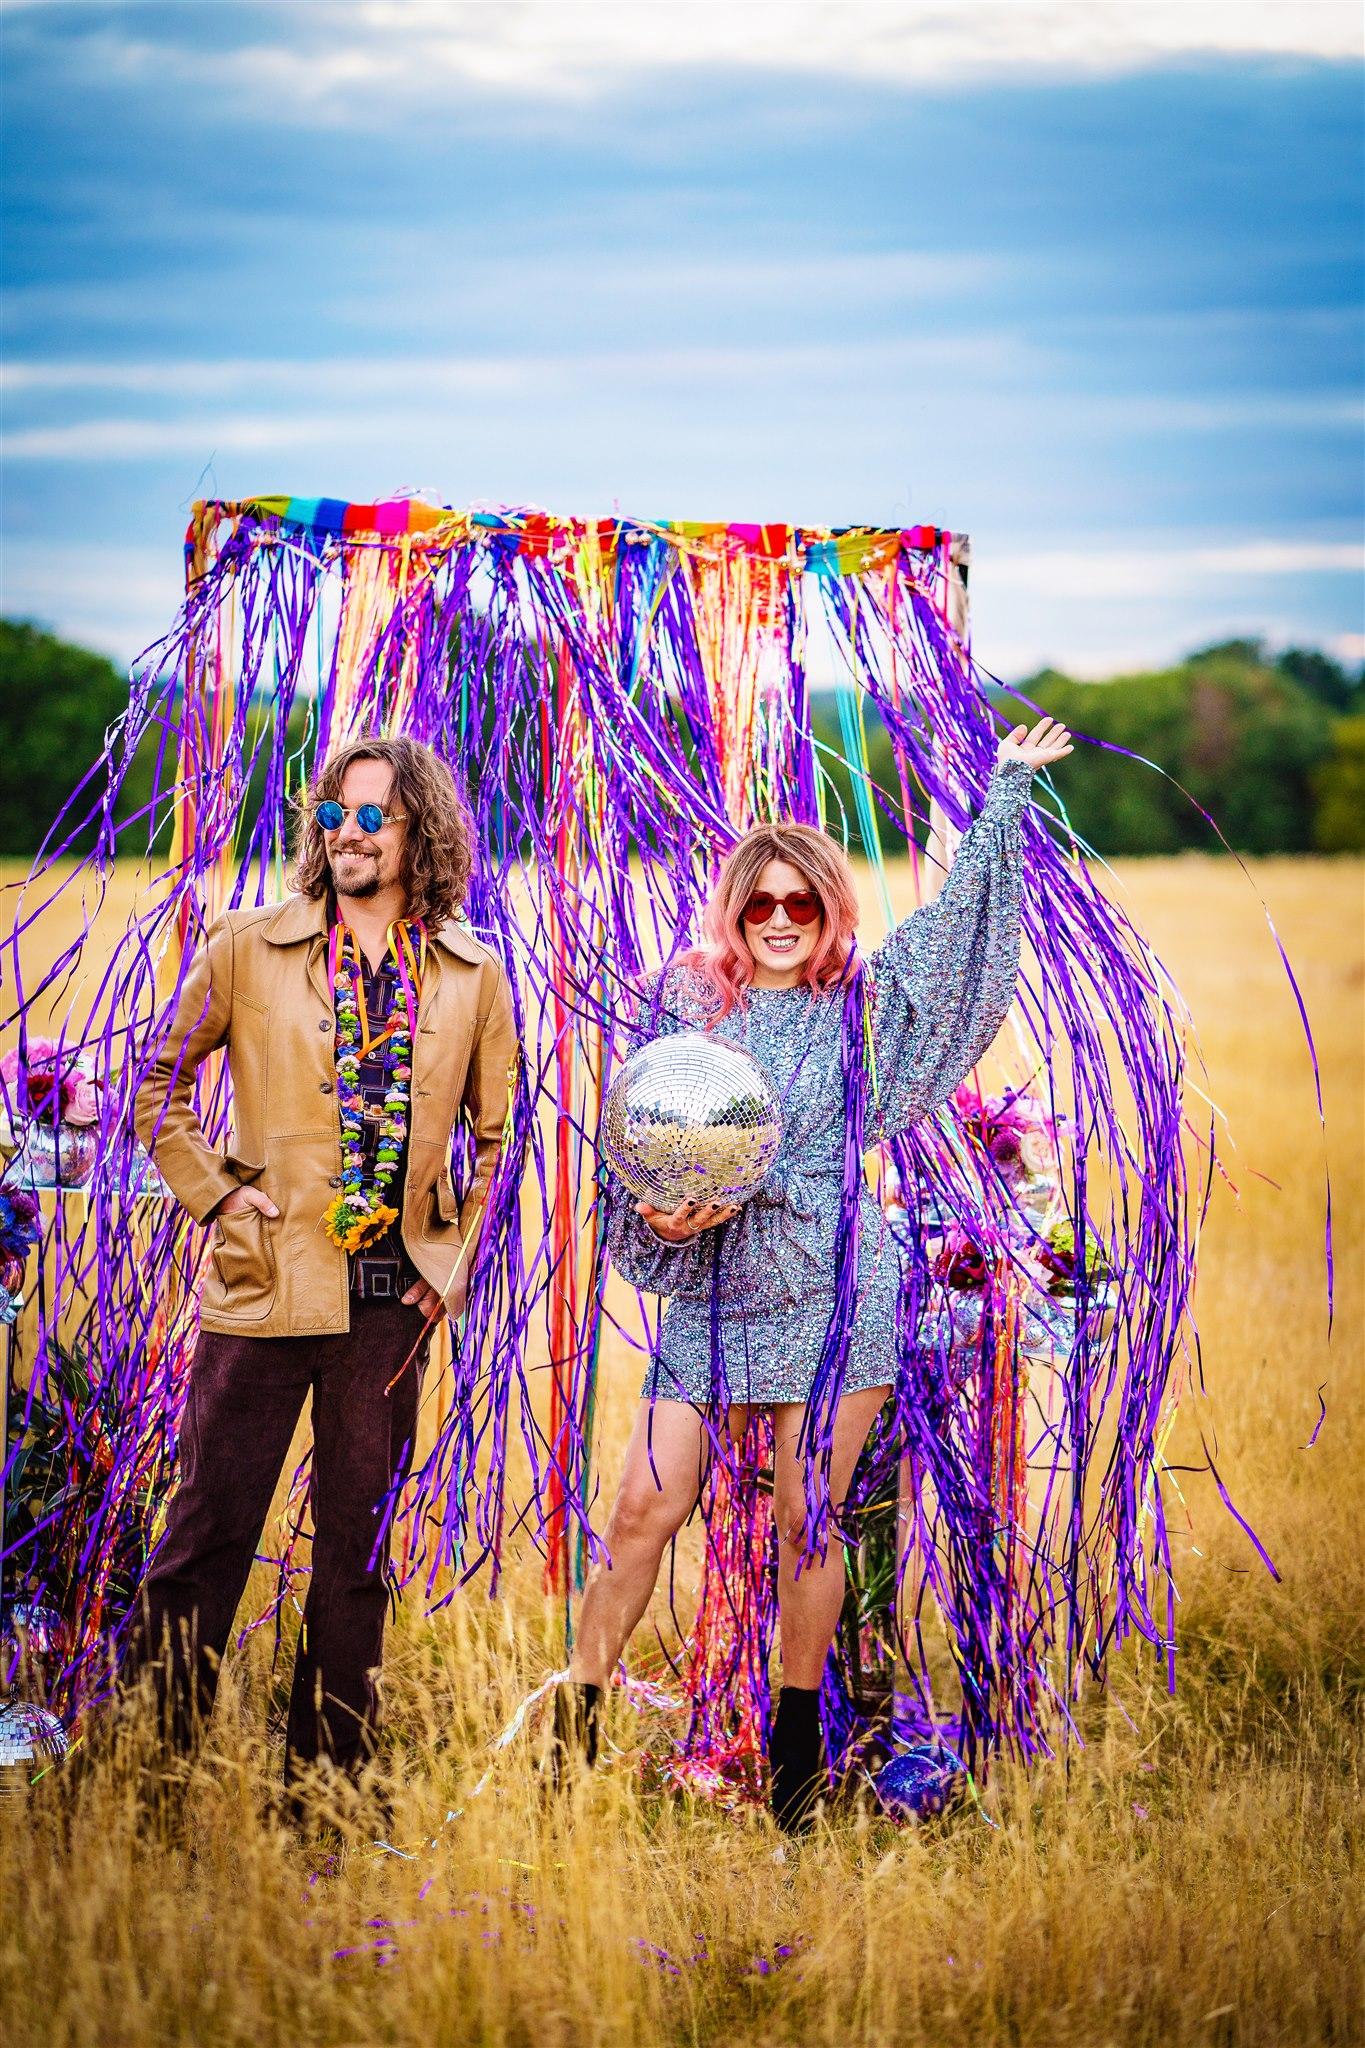 colourful bohemian wedding - 70s wedding - campervan wedding - hippie wedding - colourful wedding backdrop